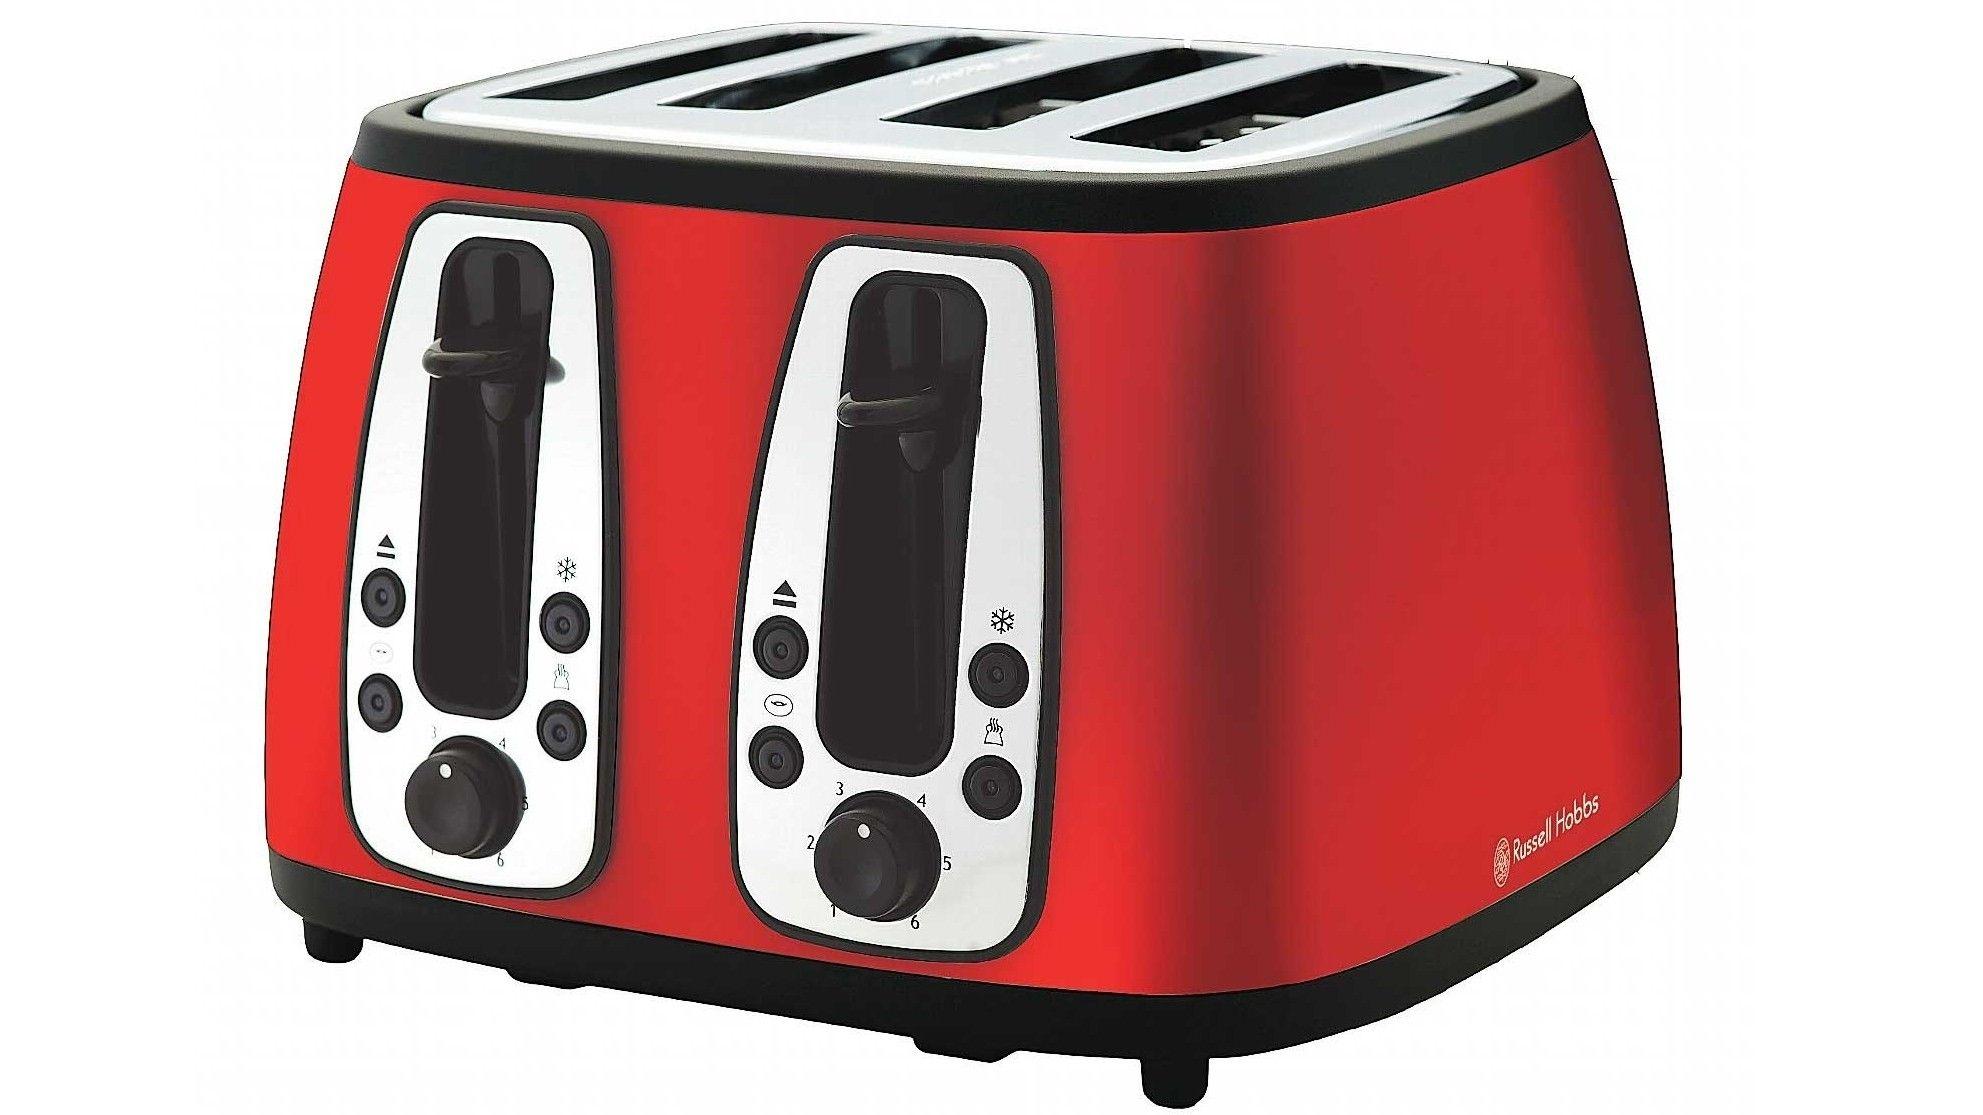 Russell Hobbs Metallic Red 4-Slice Toaster on the wishlist | The ...